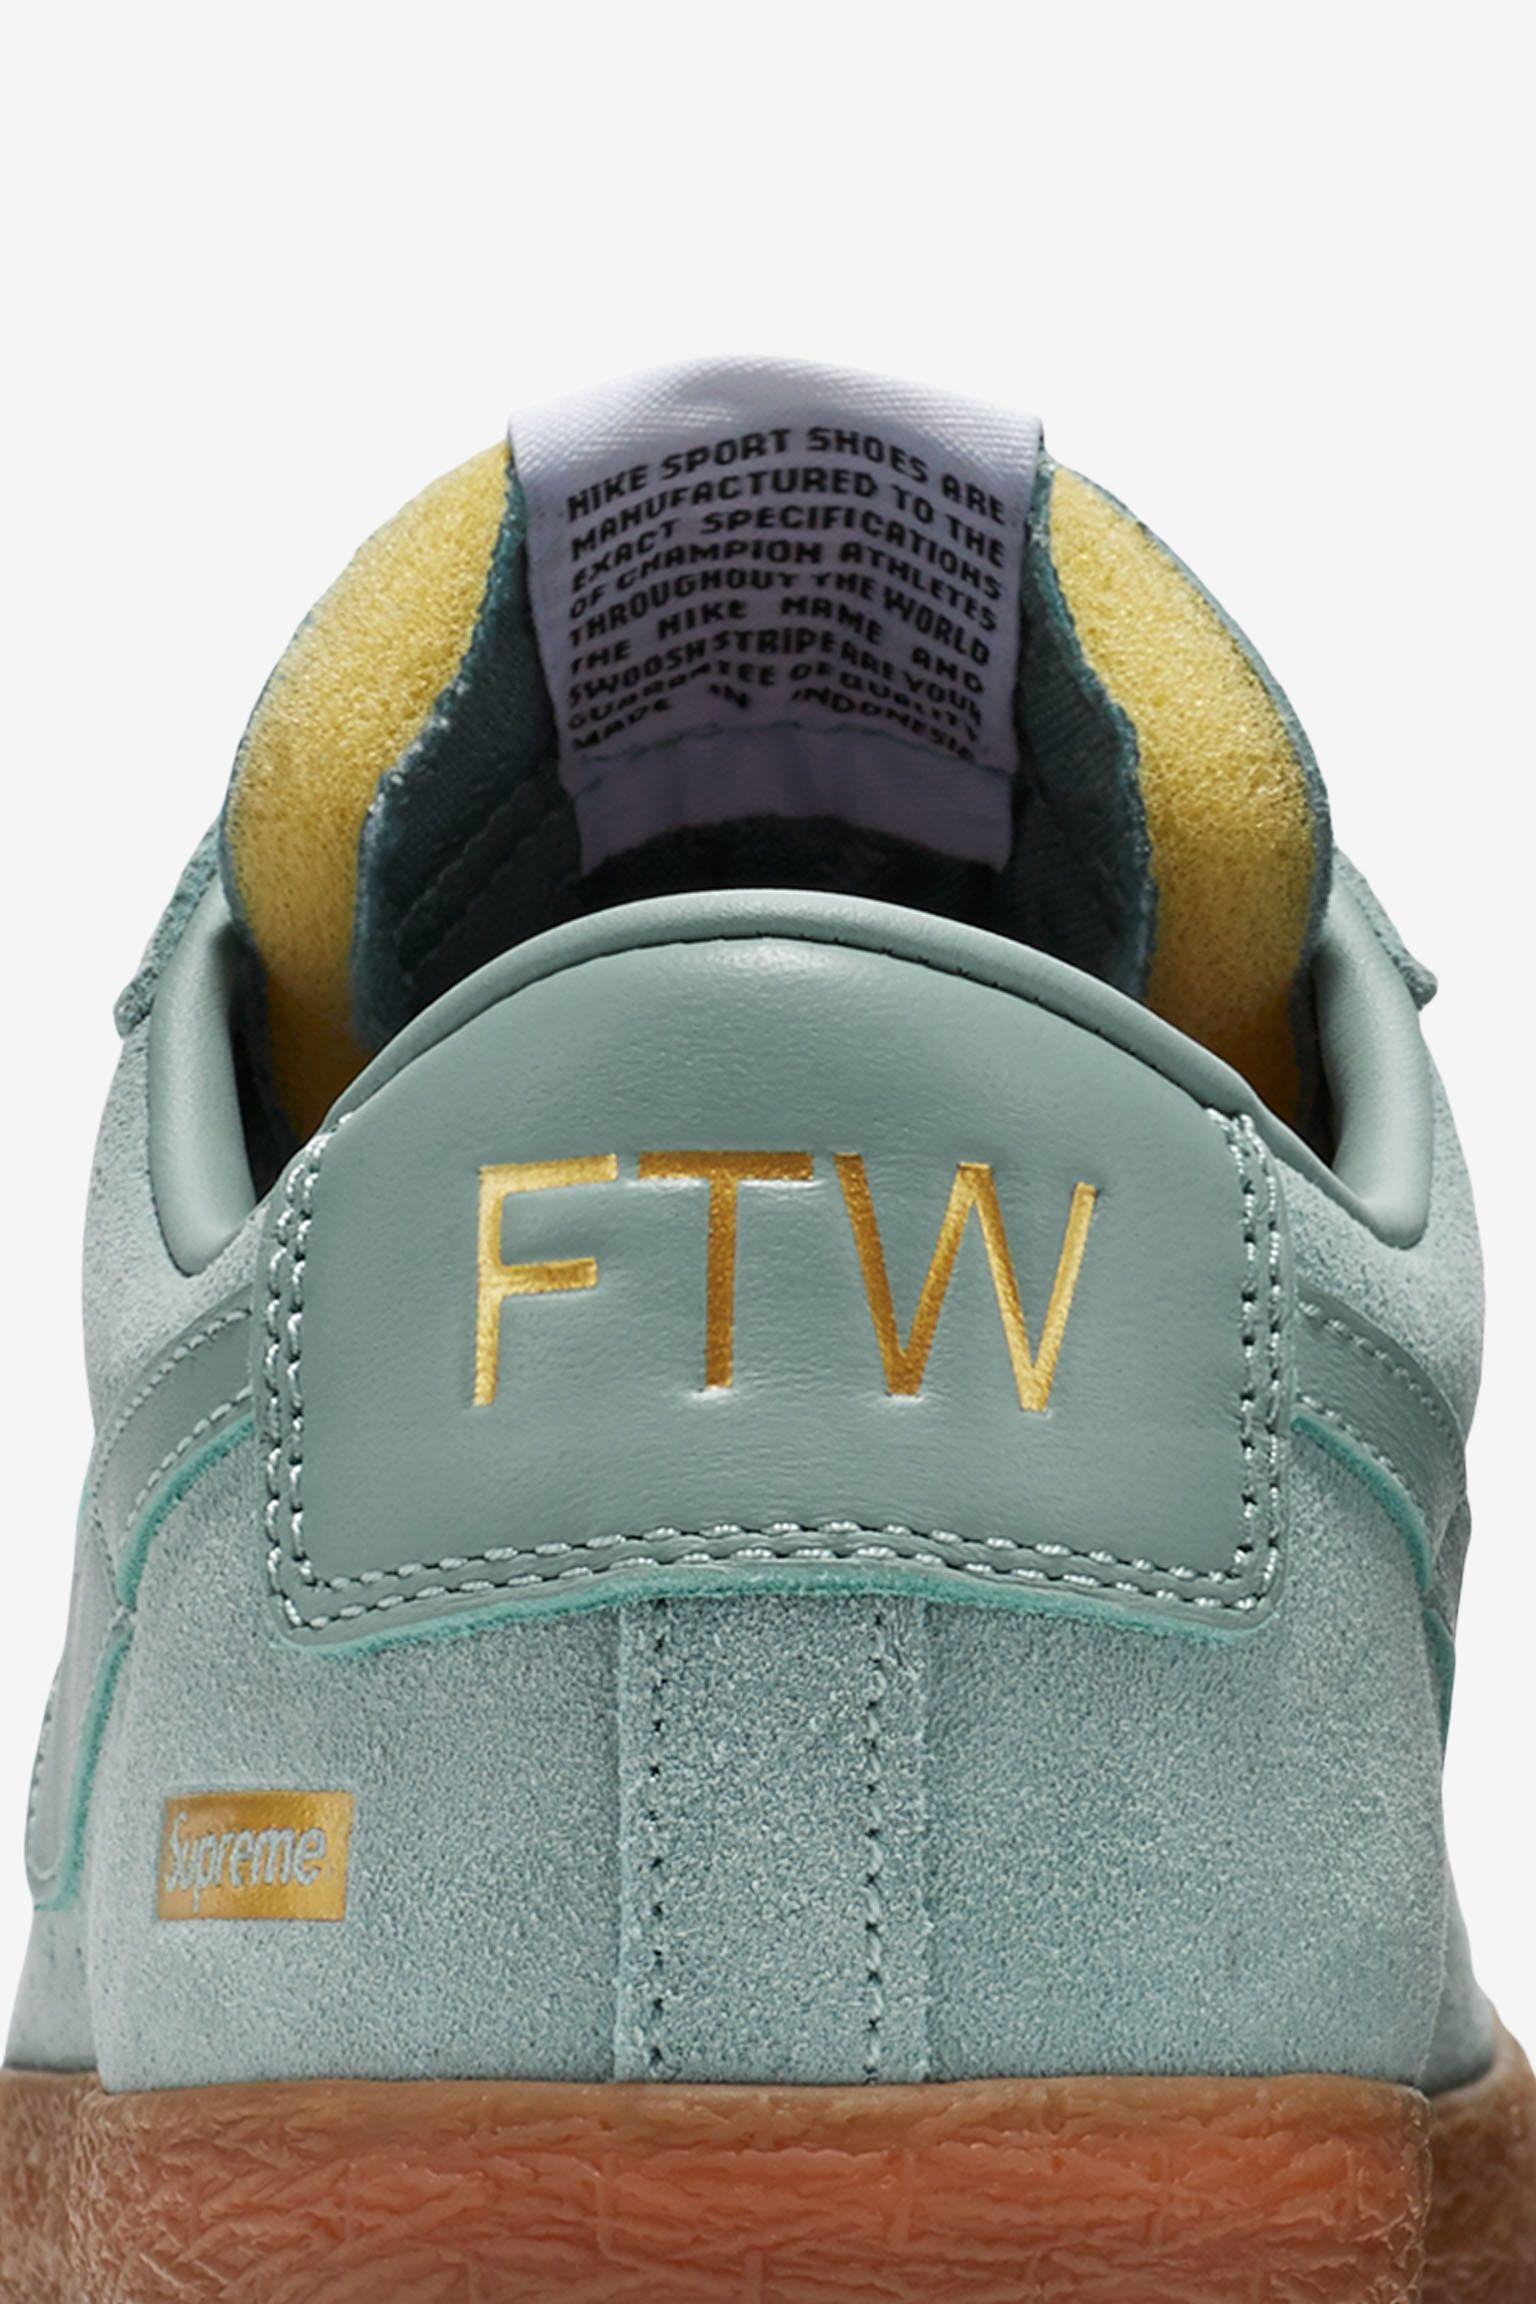 Nike Blazer Low GT x Supreme 'Cannon' Release Date